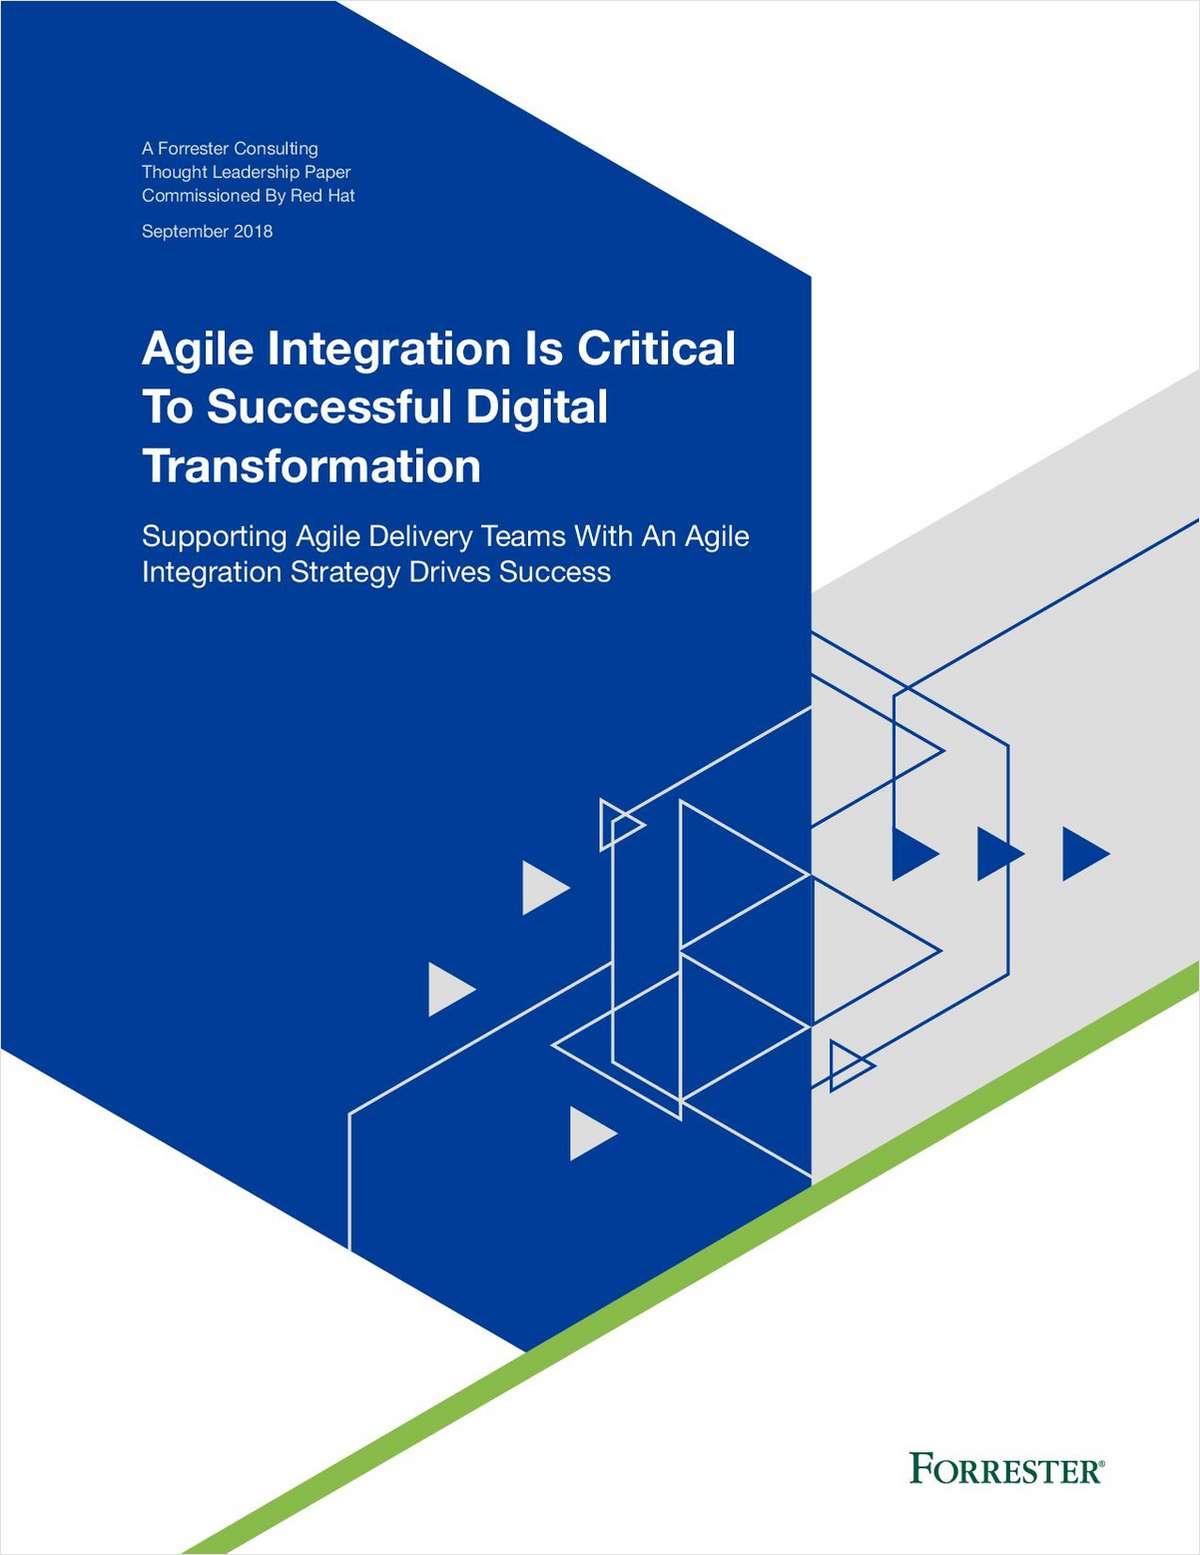 Agile Integration Is Critical To Successful Digital Transformation